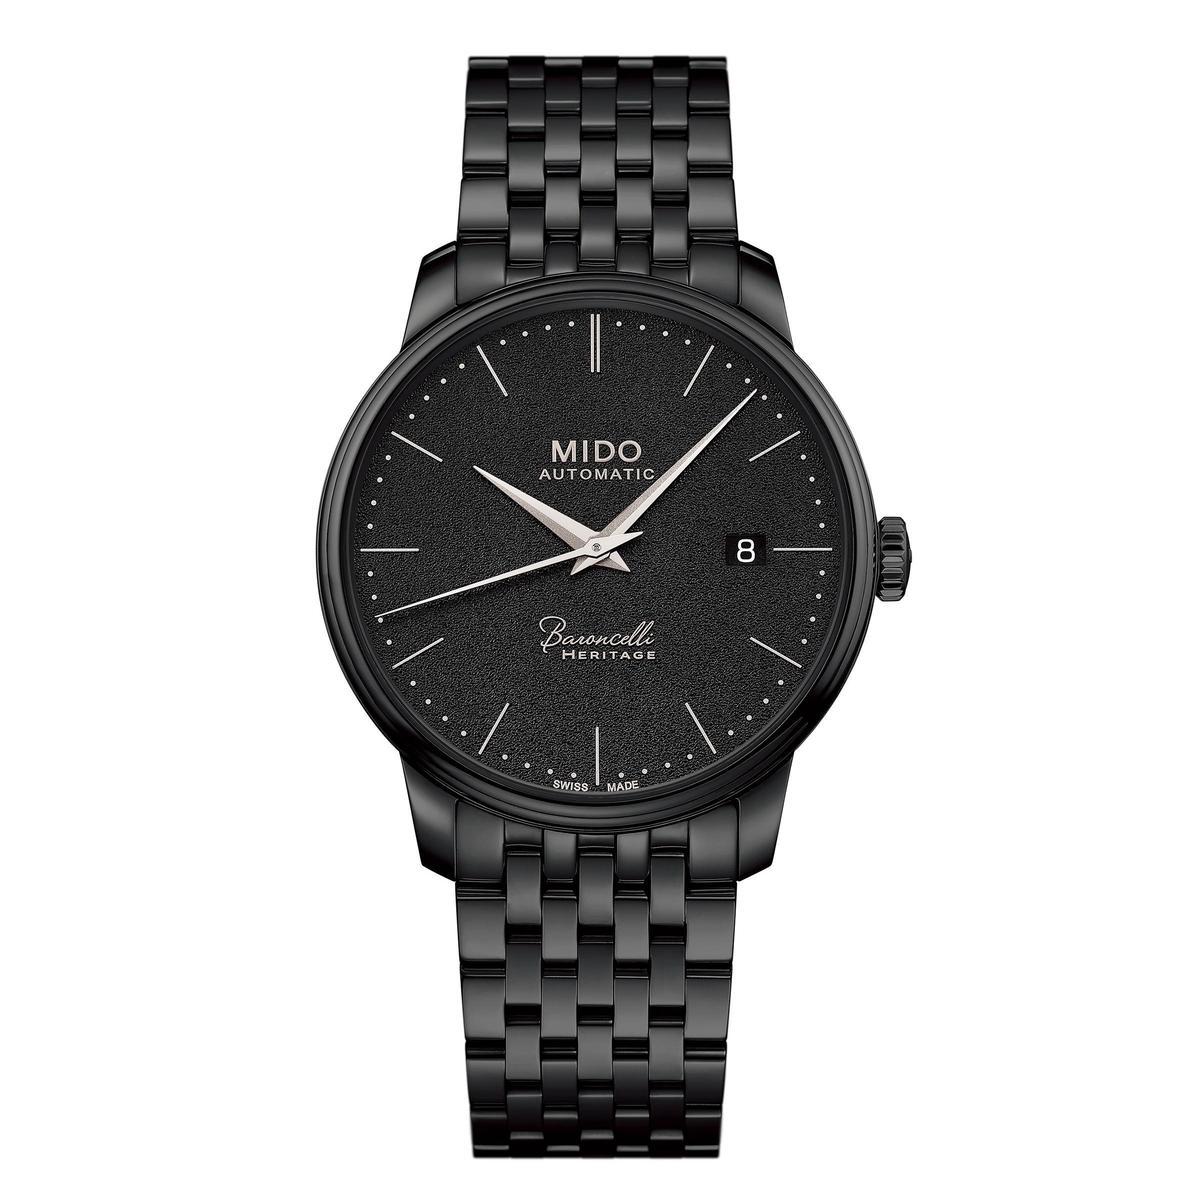 Baroncelli III Heritage全黑版,39mm黑色PVD不鏽鋼錶殼,裝載Caliber 1192自動上鏈機芯,定價NT$39,000。